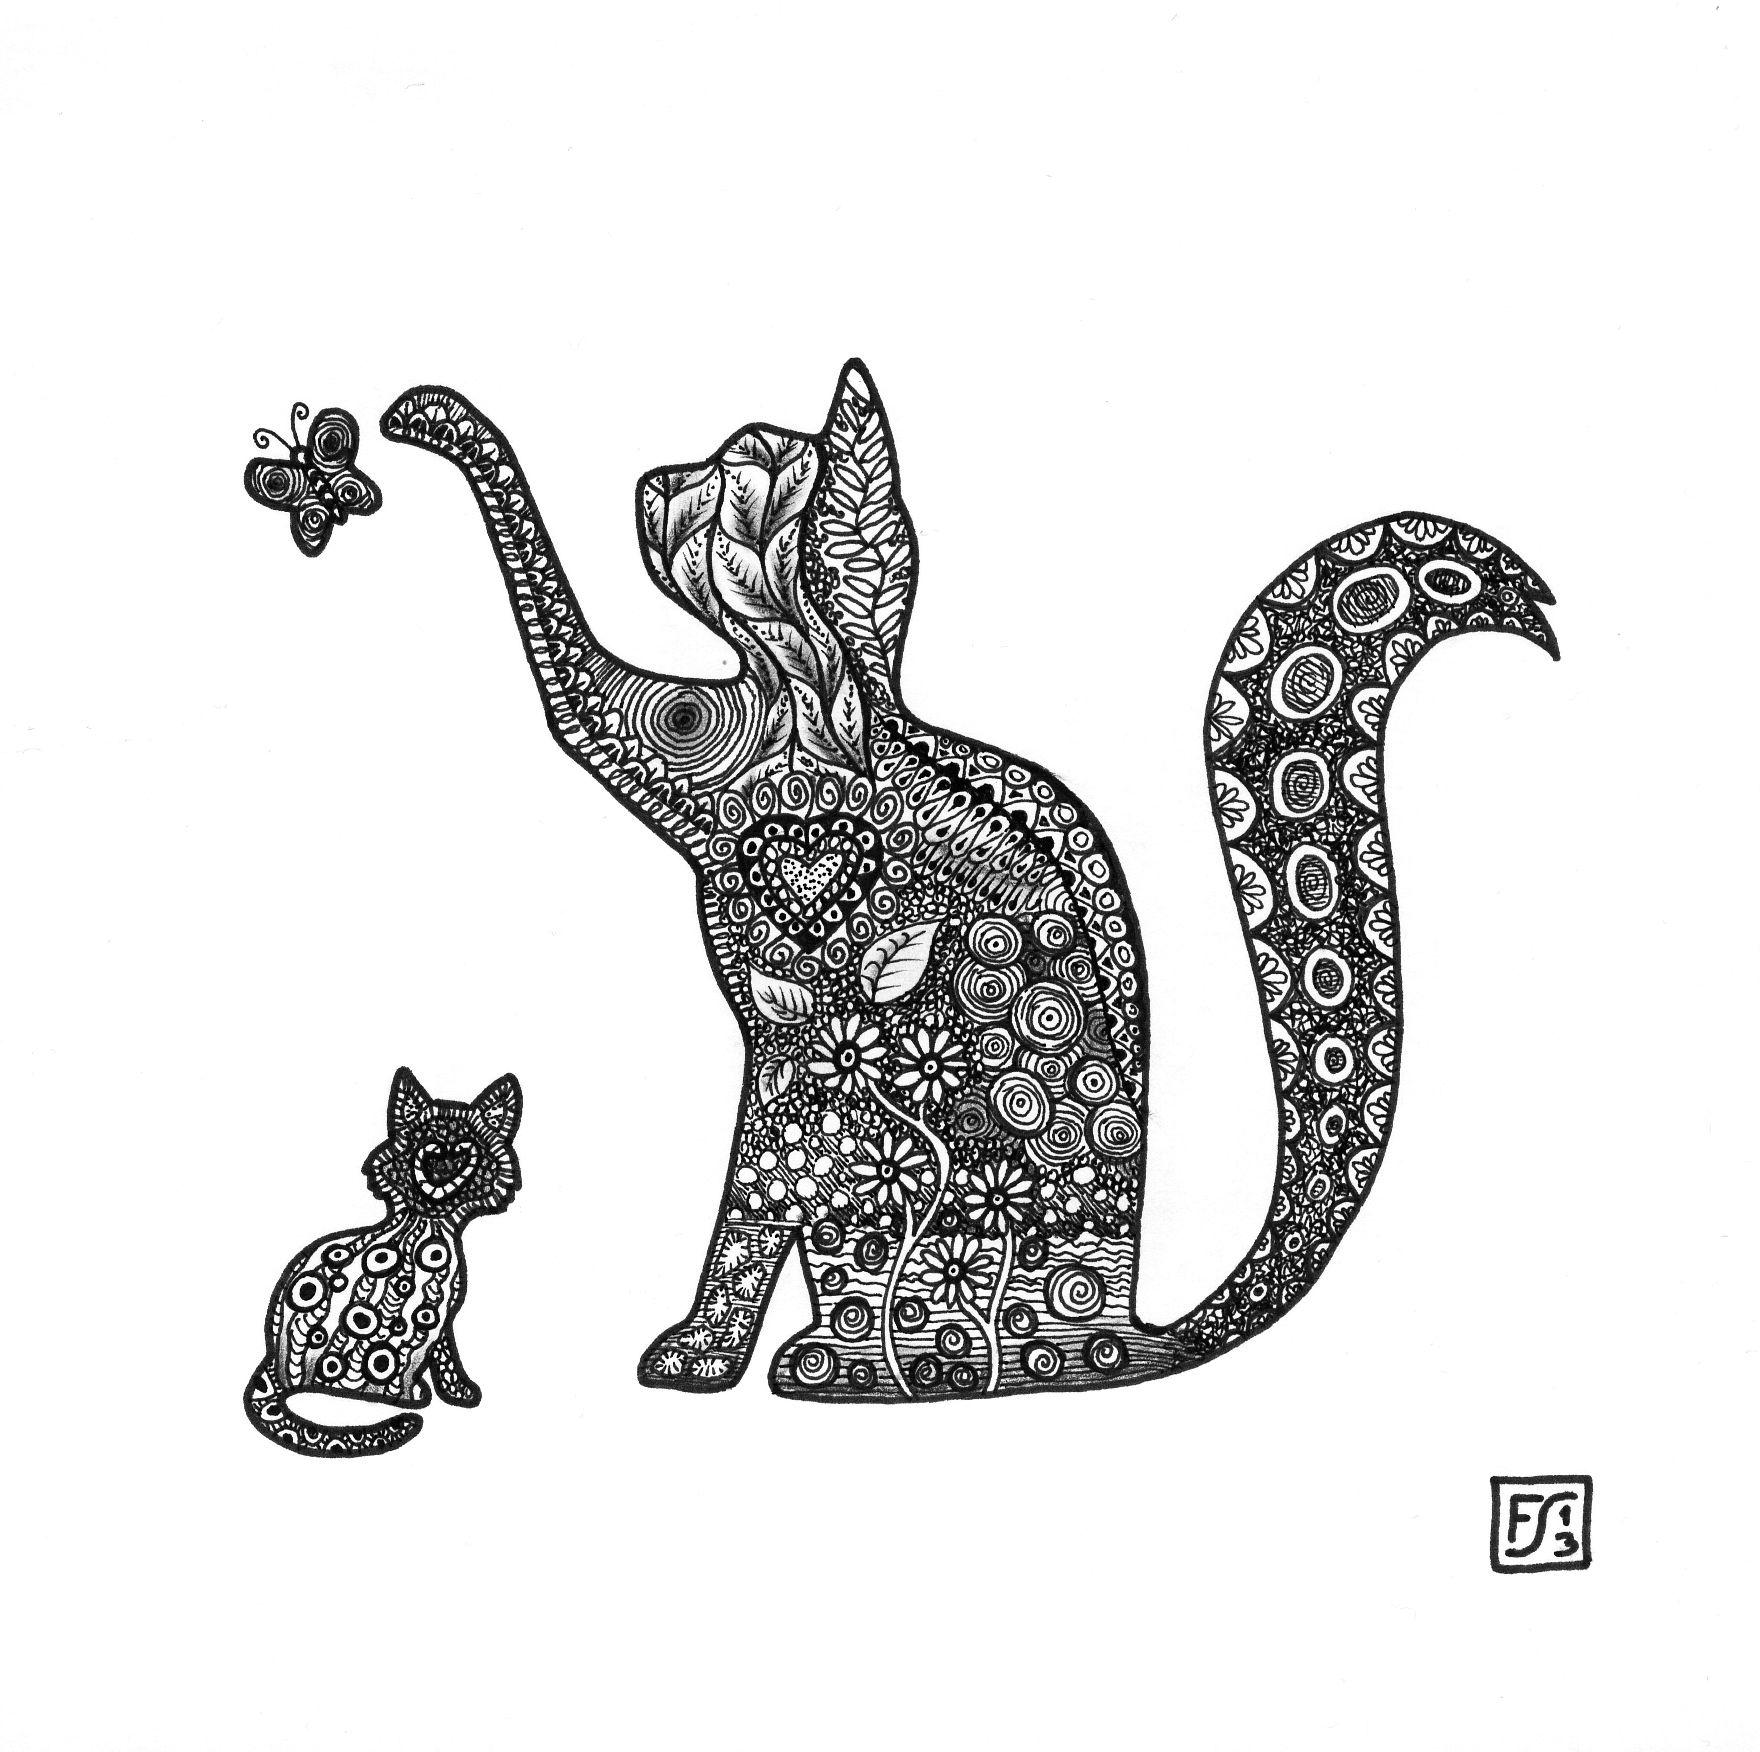 Cat And Kitten Tangling Together By Gormashdeviantart On DeviantArt